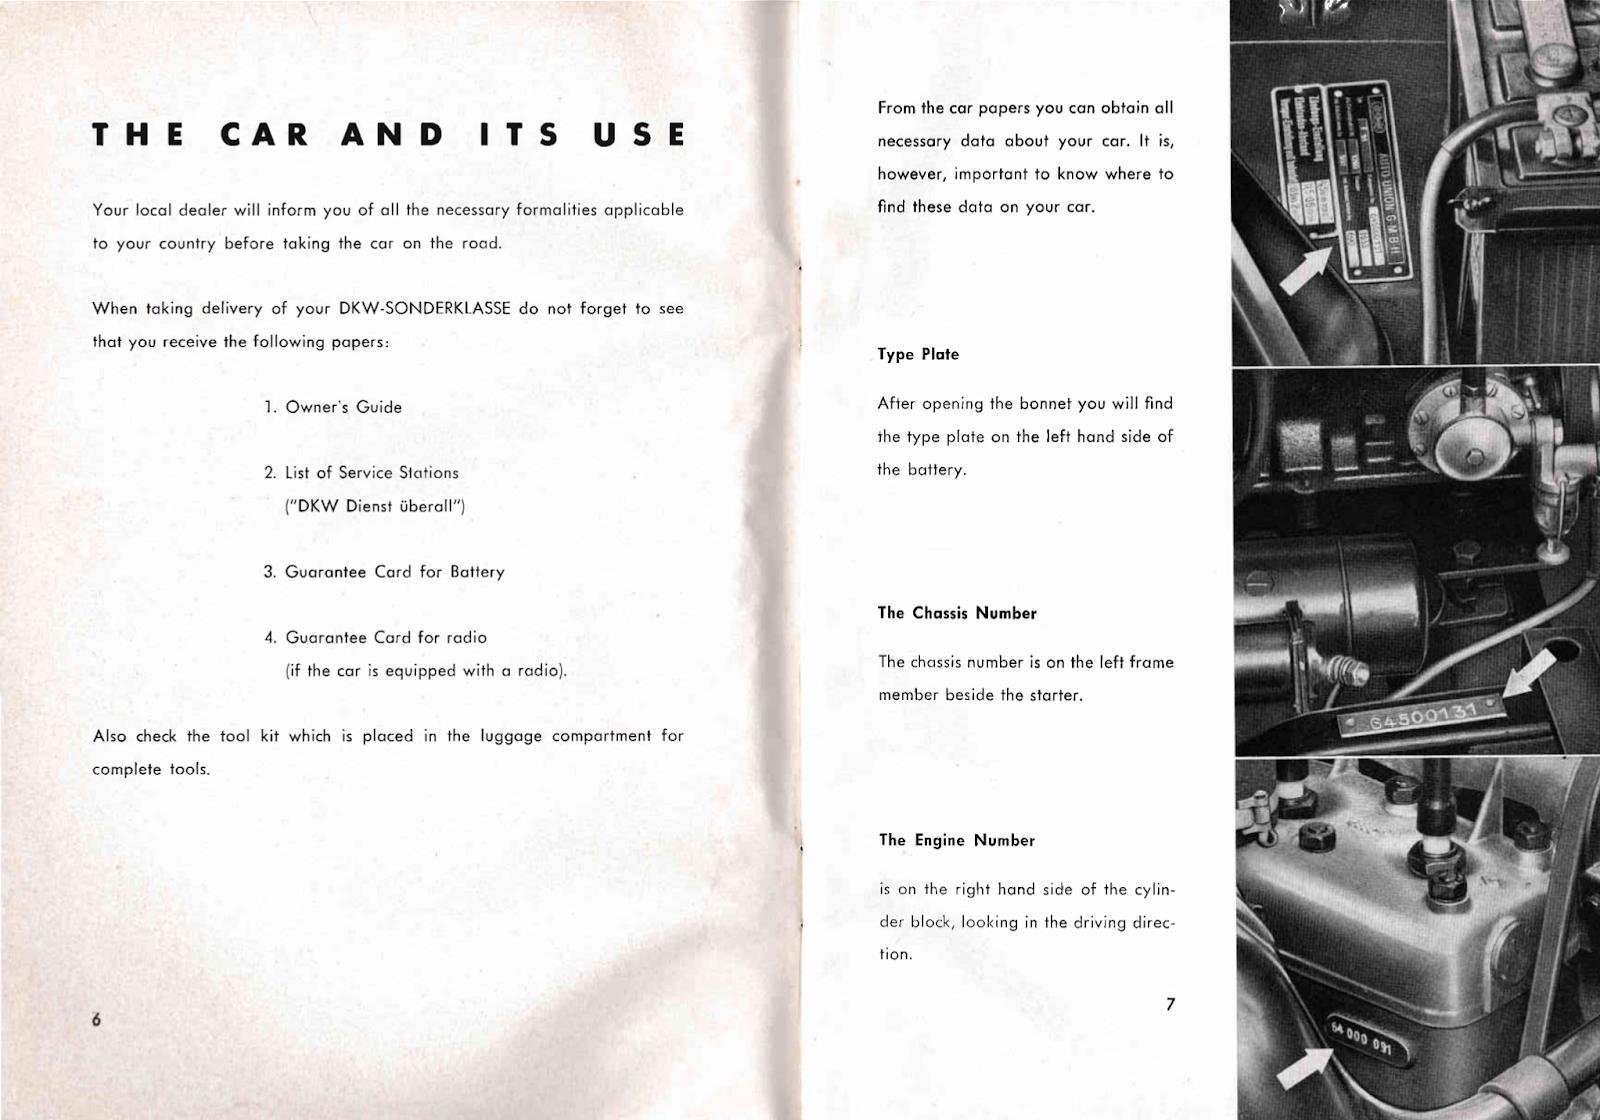 DKW Auto-Union Project: 1954 DKW Sonderklasse Owners Manual